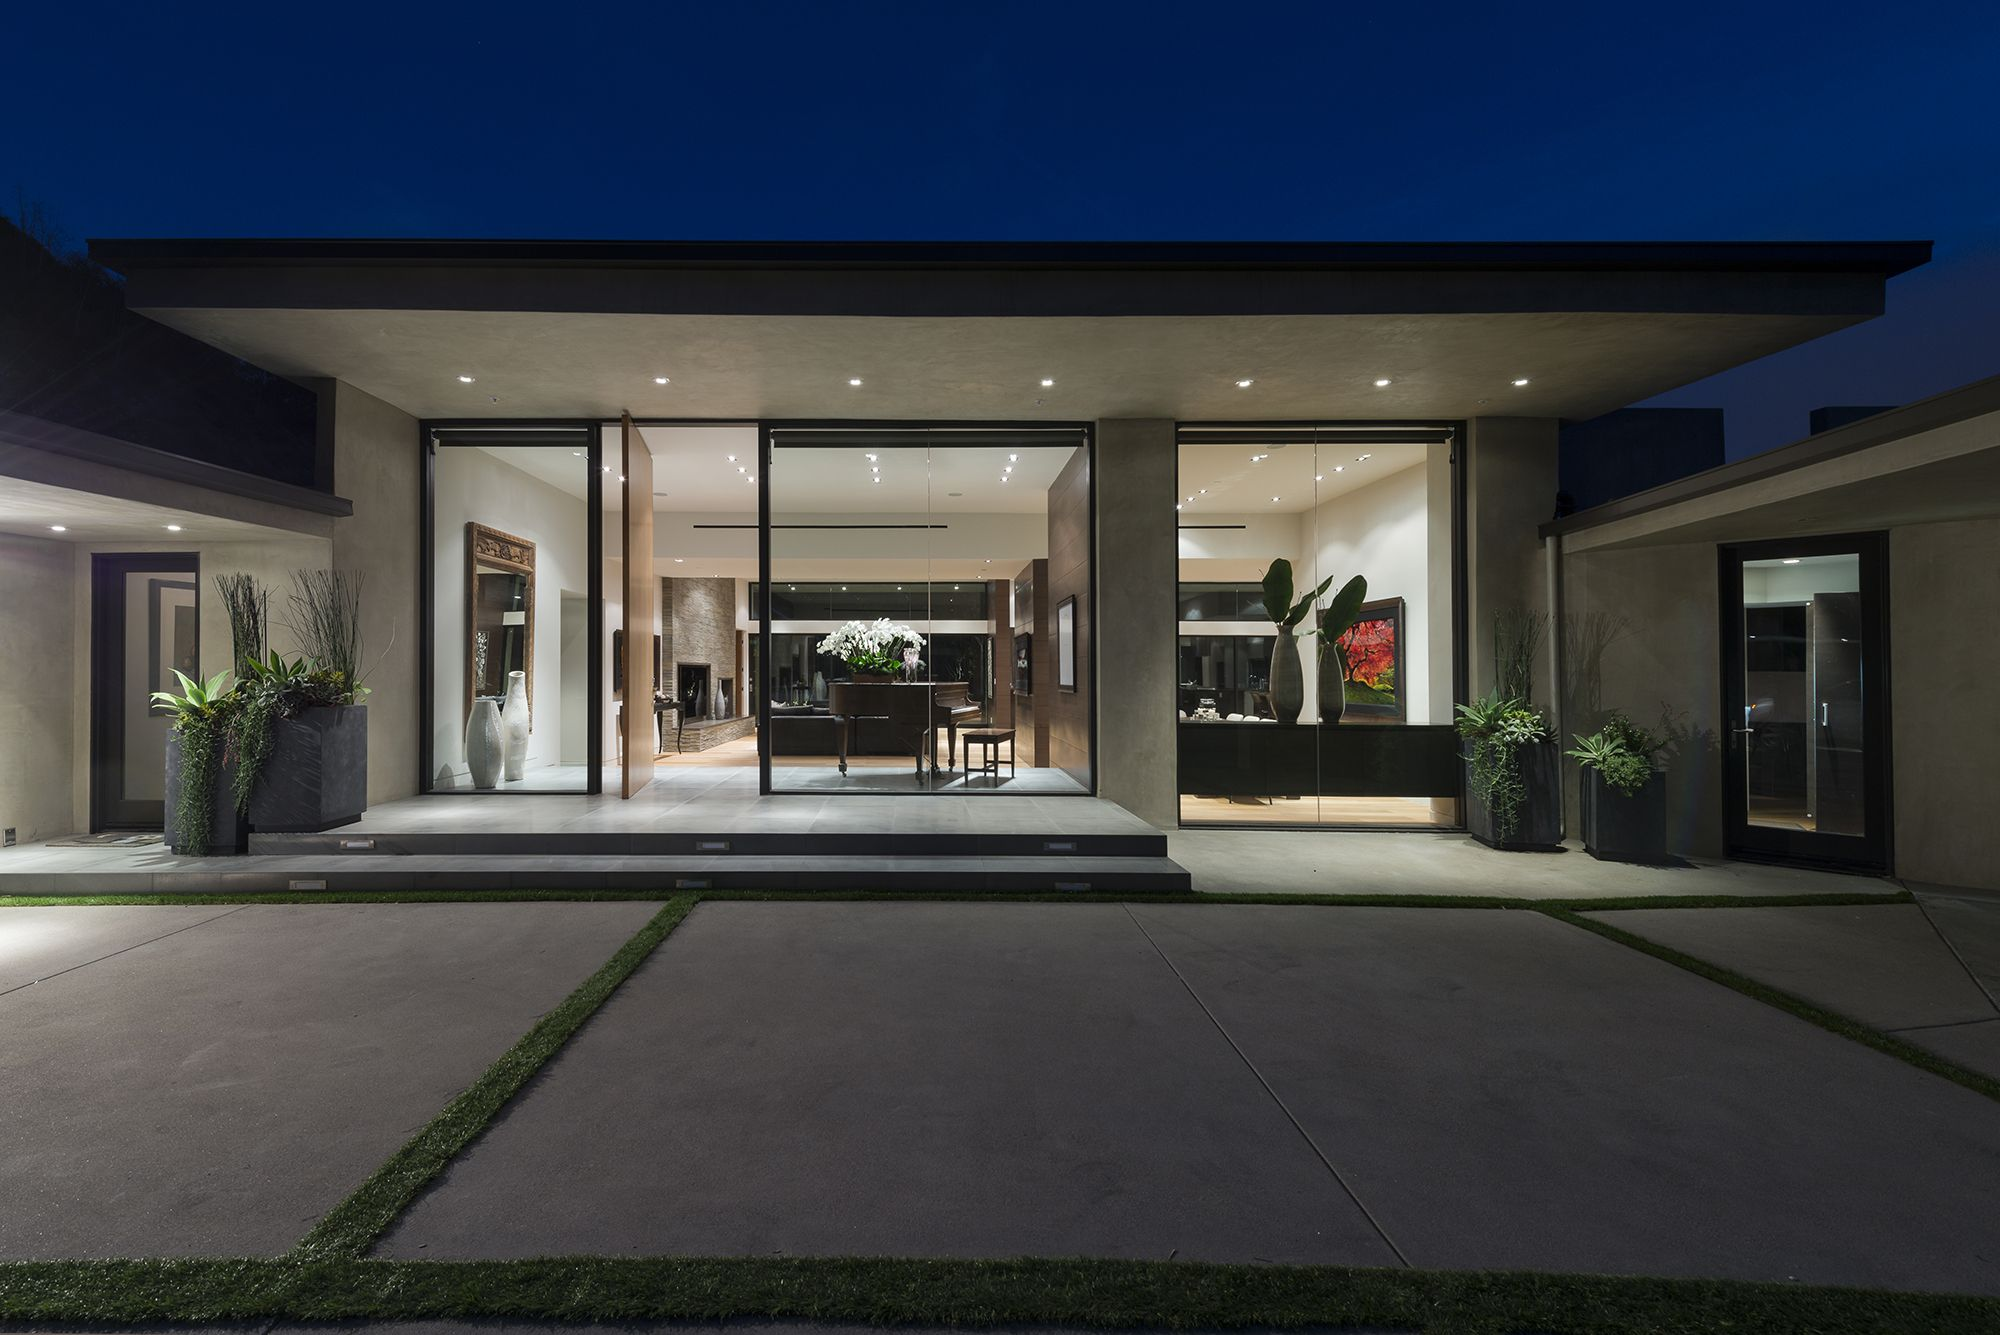 Single Story Contemporary House Design Homeworlddesign Homeideas Housedesign Interiordesi Contemporary House Plans Modern House Exterior Modern House Plans